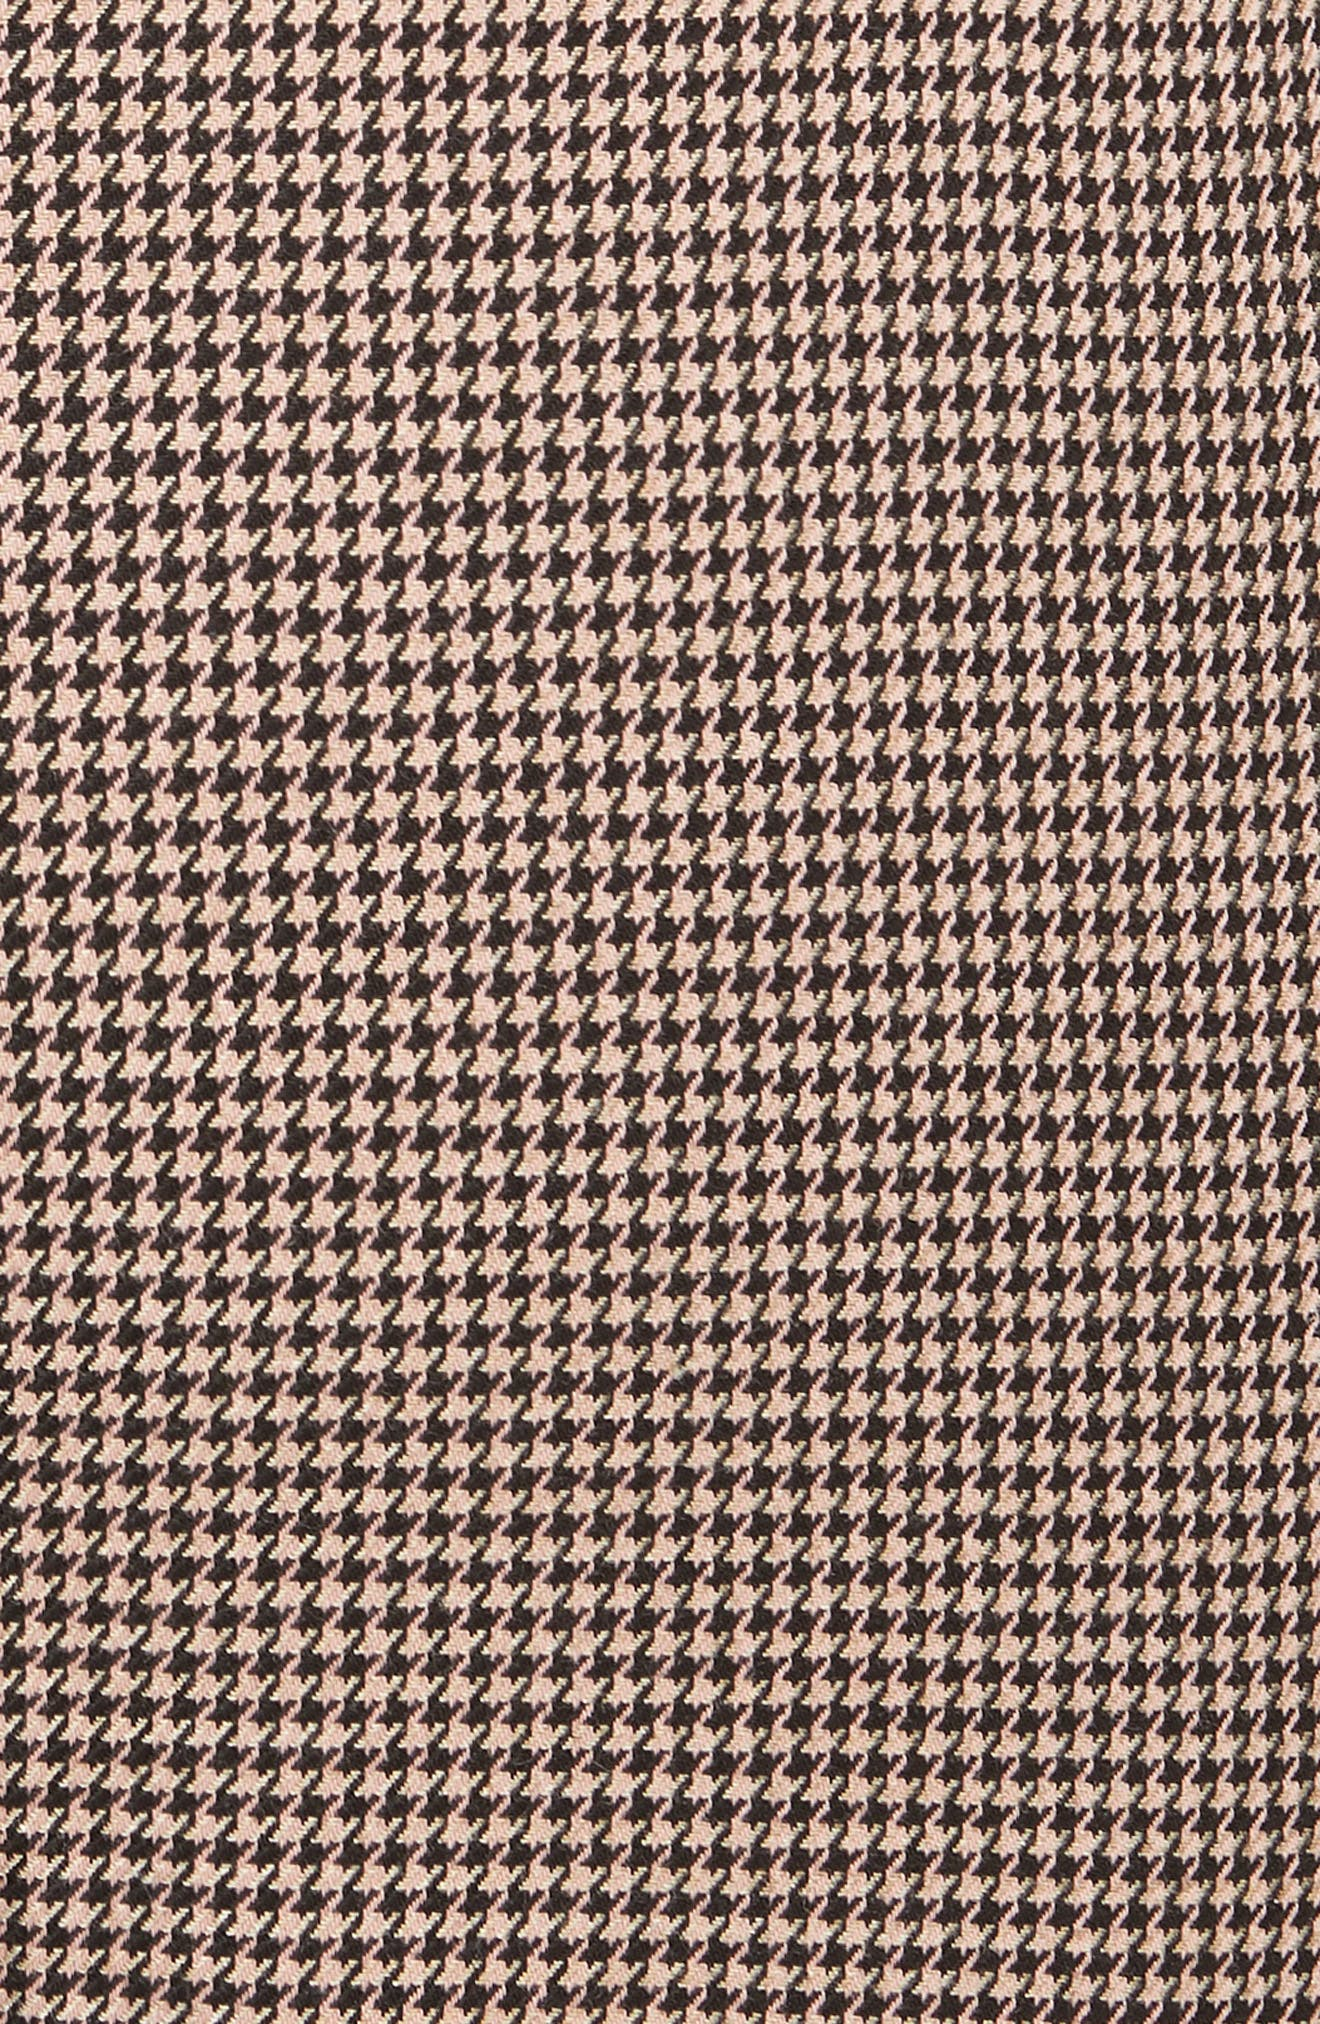 Houndstooth Check Stretch Cotton Blend Pants,                             Alternate thumbnail 5, color,                             CAMEL/ BLACK